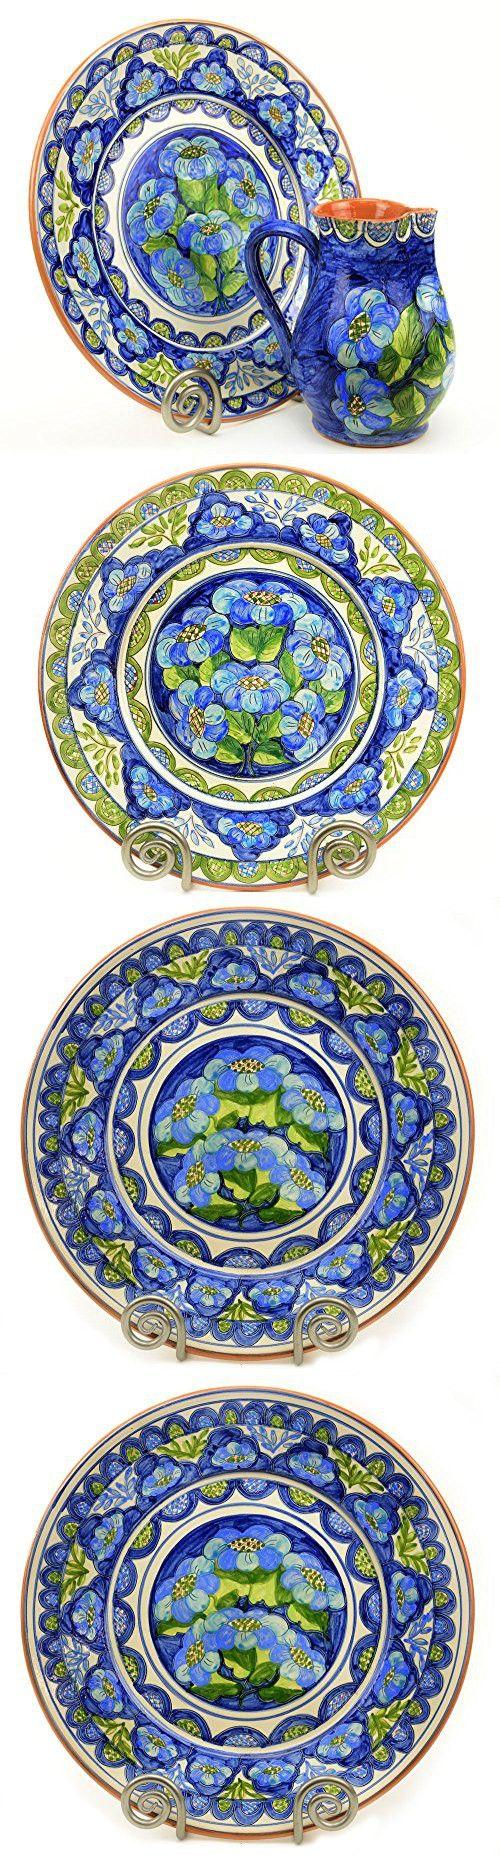 Decorative Plate for Home Decor, Mediterranean Blue and Green, Medium